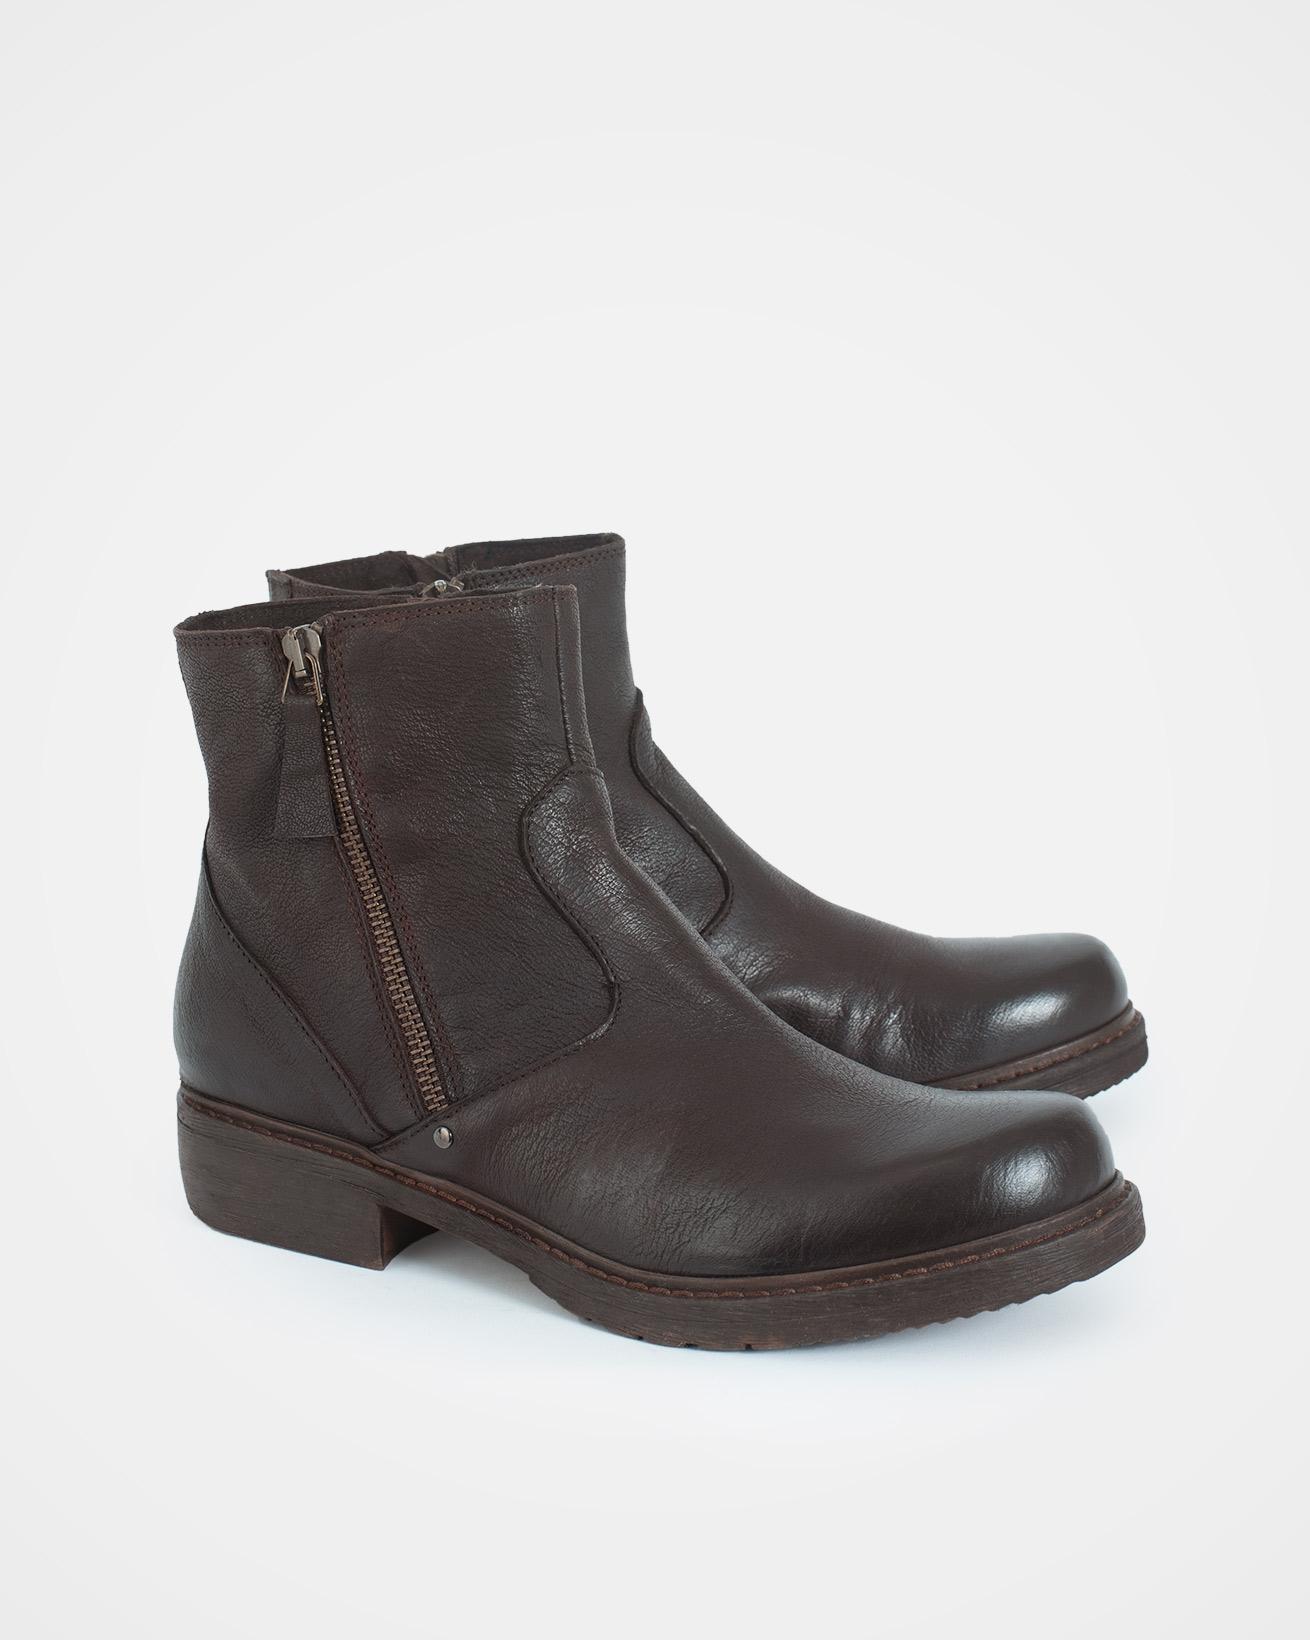 Short double zipped boots - Size 38/37 - Ebony - 1729